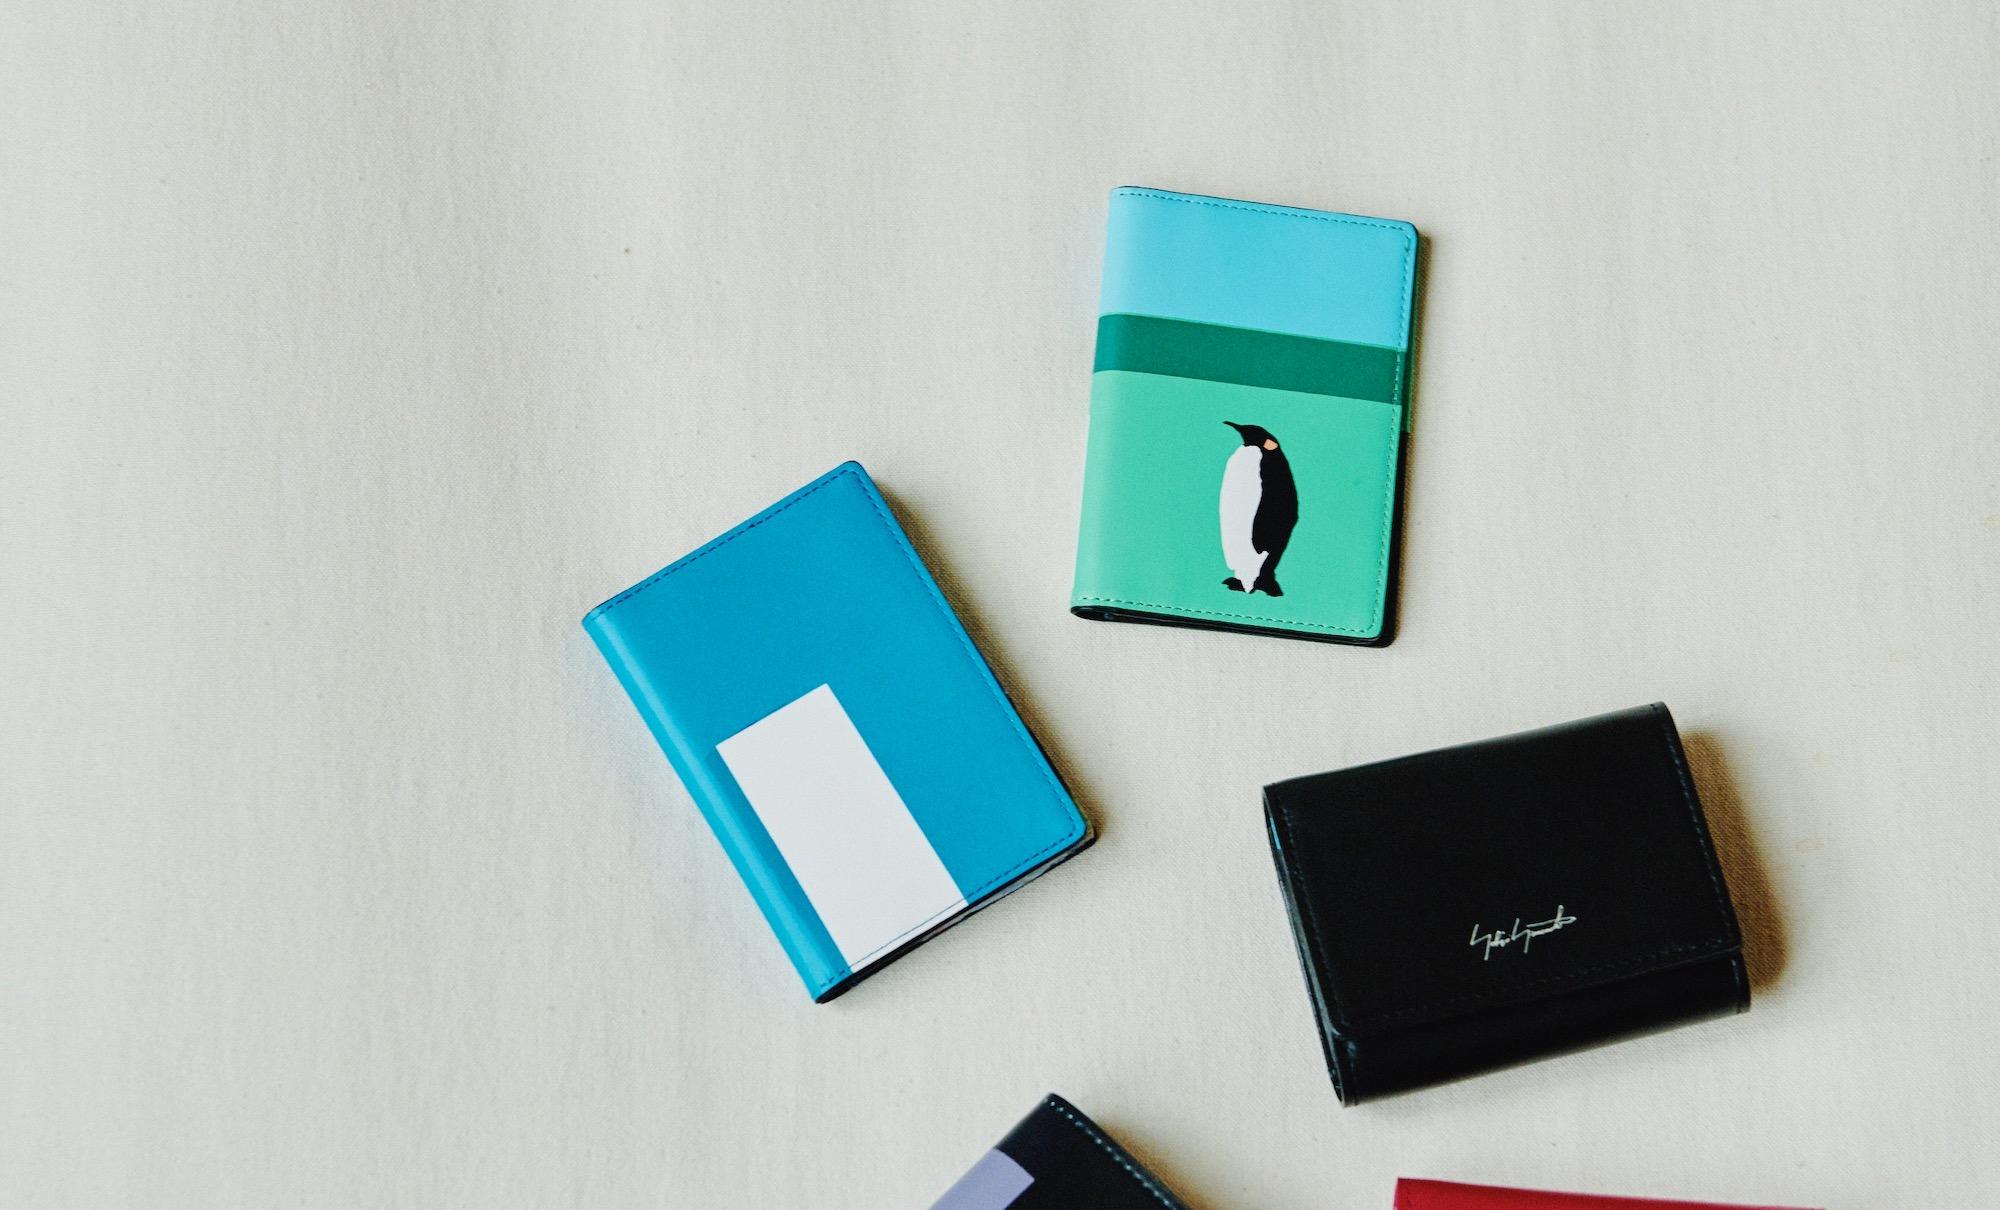 discord Yohji Yamamoto、アーティスト猪瀬直哉とのカプセルコレクション発売